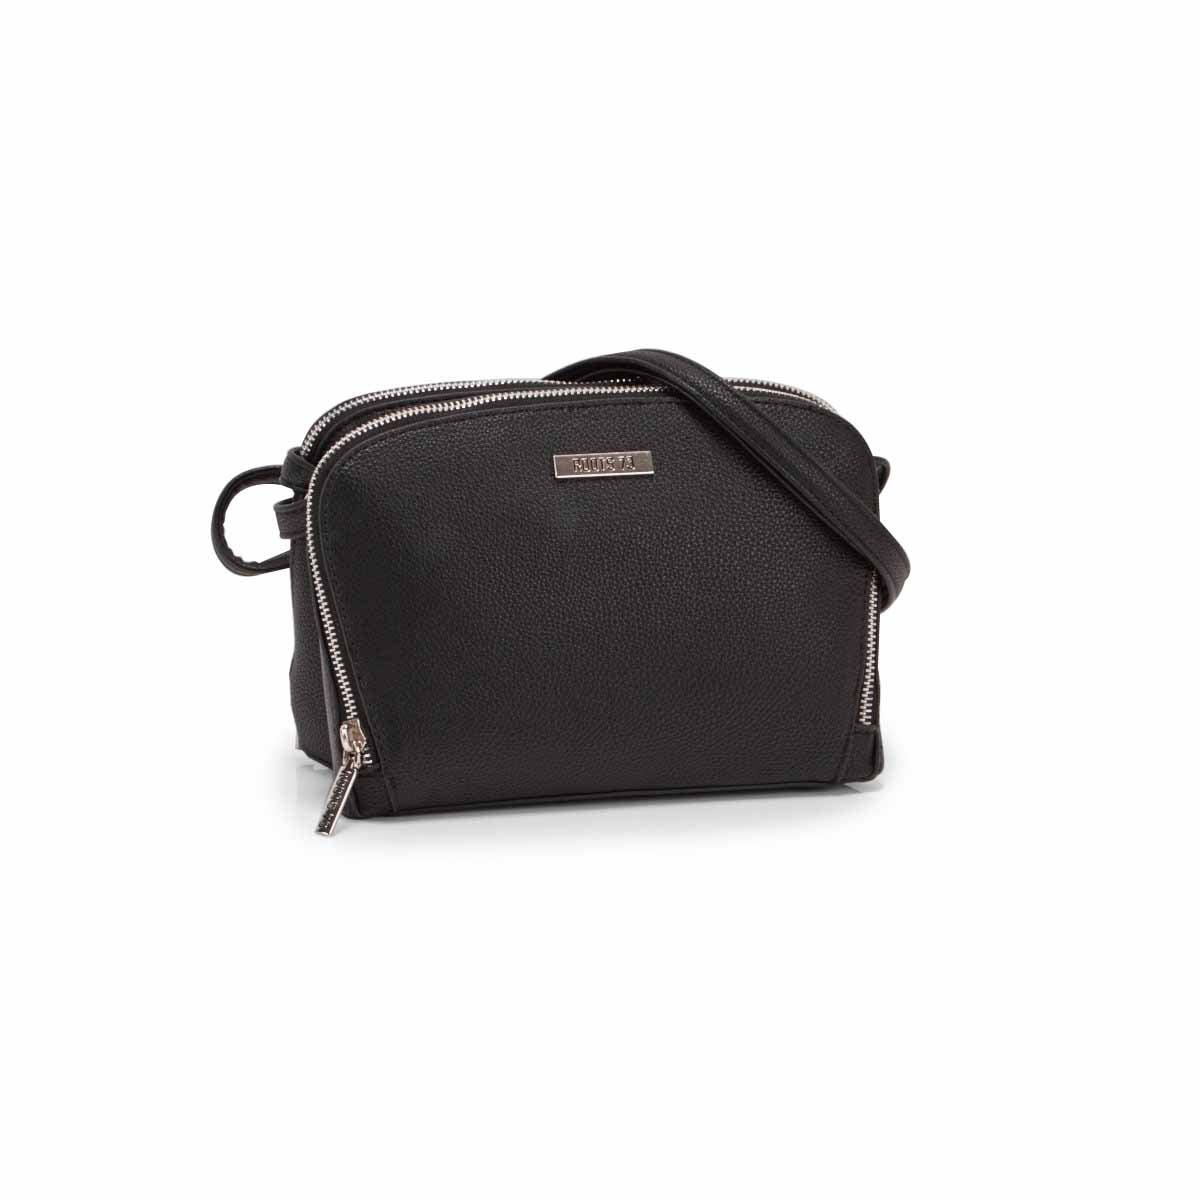 Lds Roots73 black 2 compartment bag